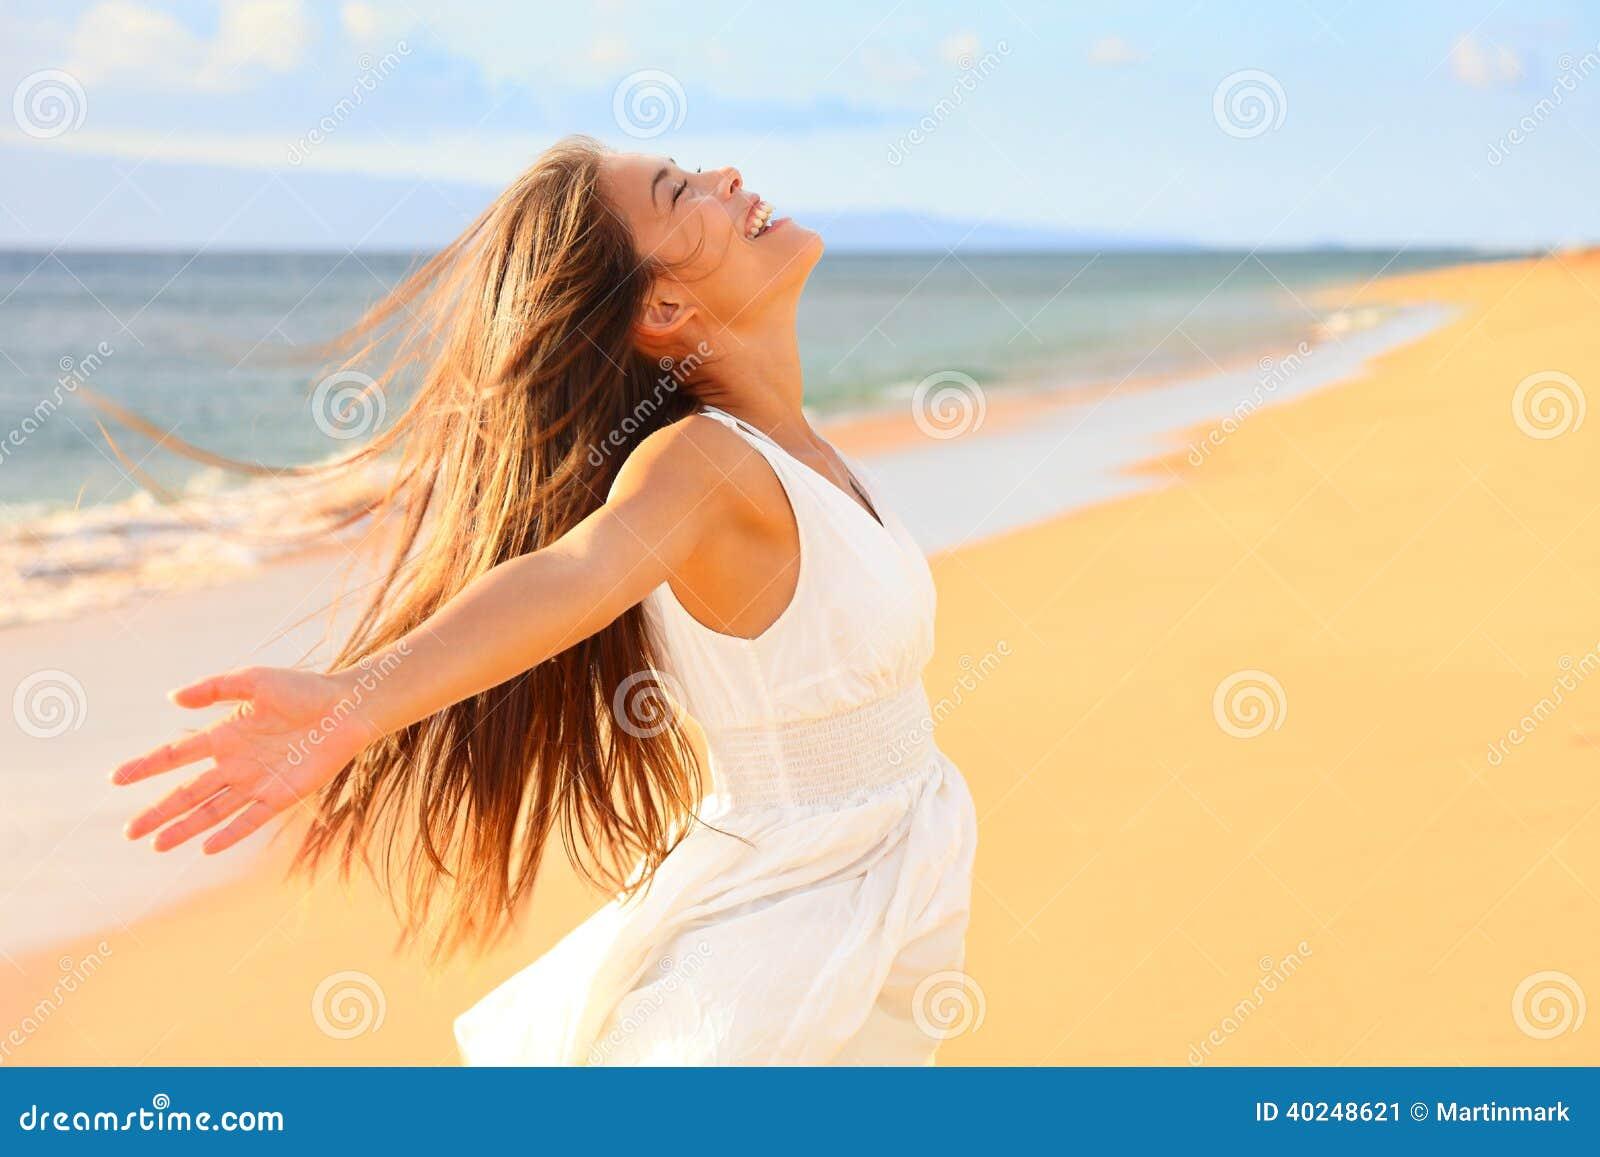 Free beach freedom beach nudism naturalist video 6